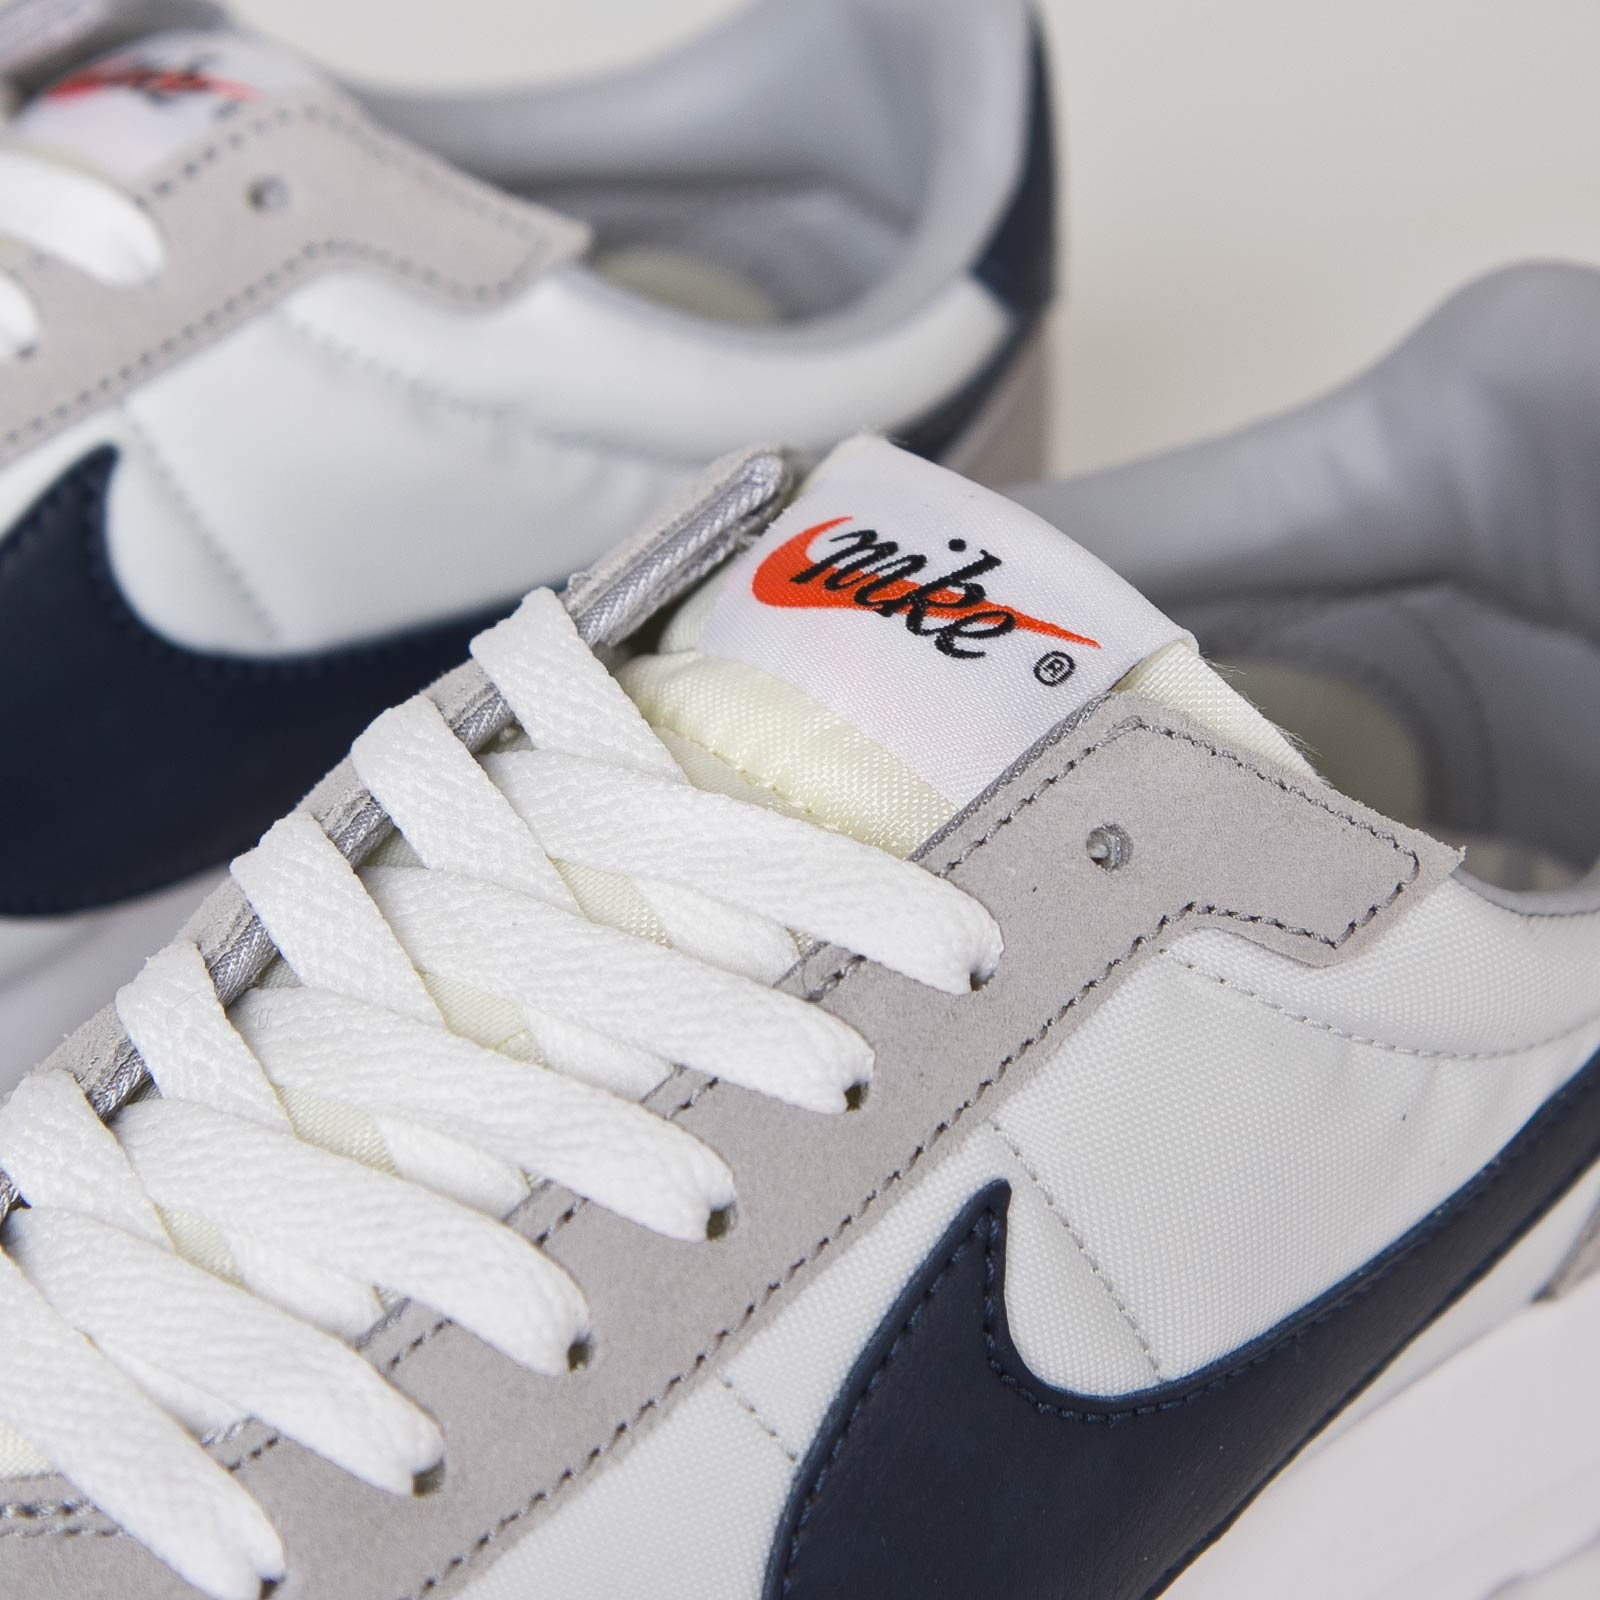 detailed look 520d8 ec4b3 Nike Roshe LD-1000 QS - 5. Close